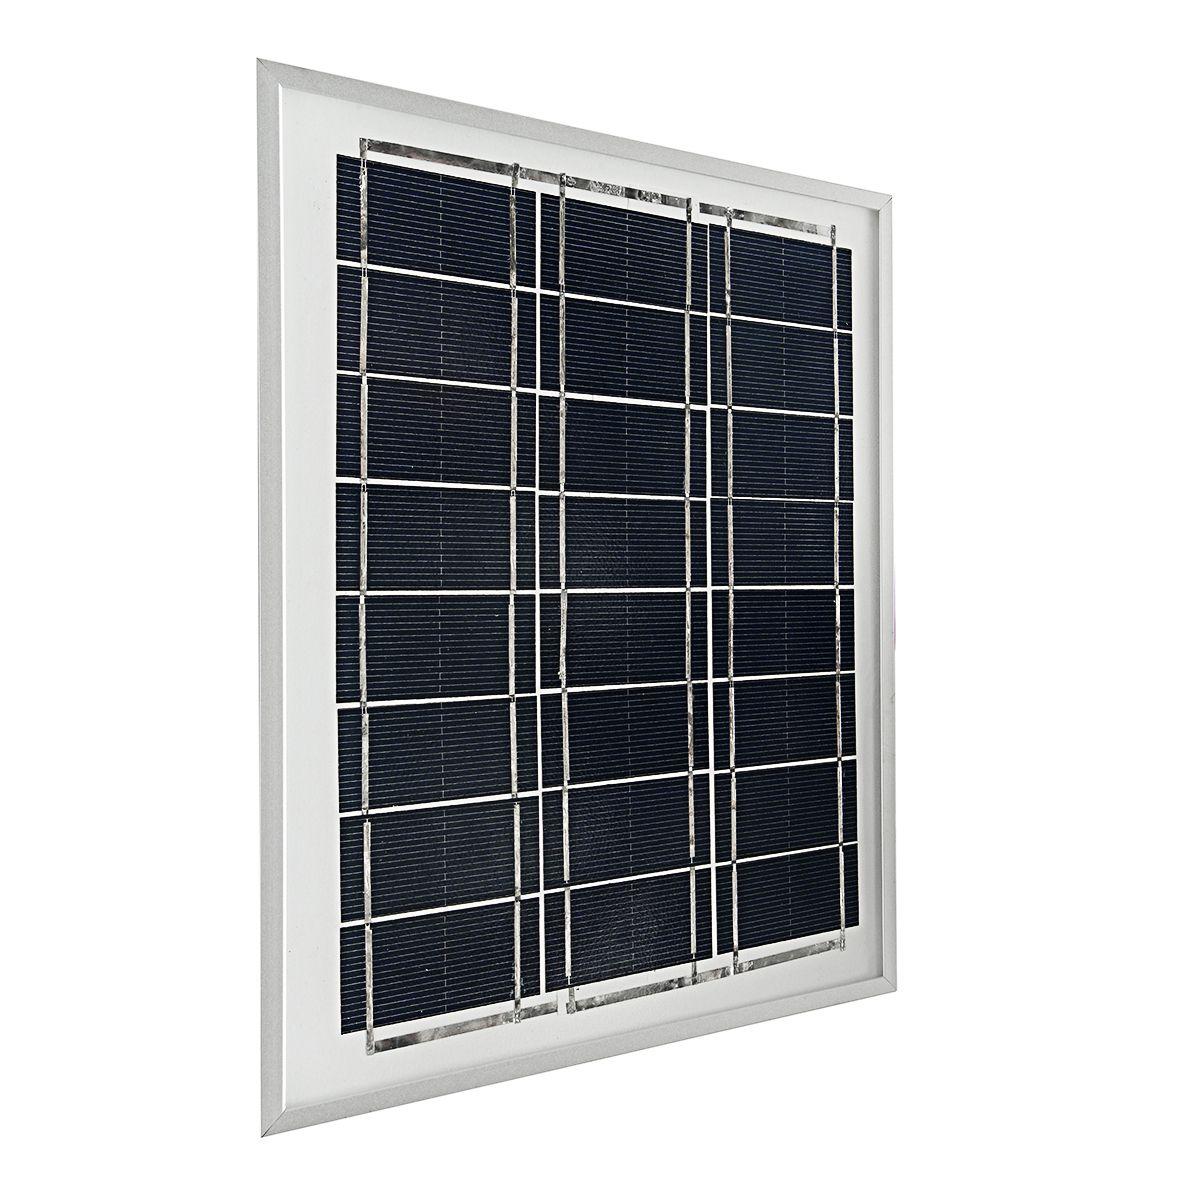 Scm Solar elfeland 12v 5w polycrystalline a class solar panel for home garden